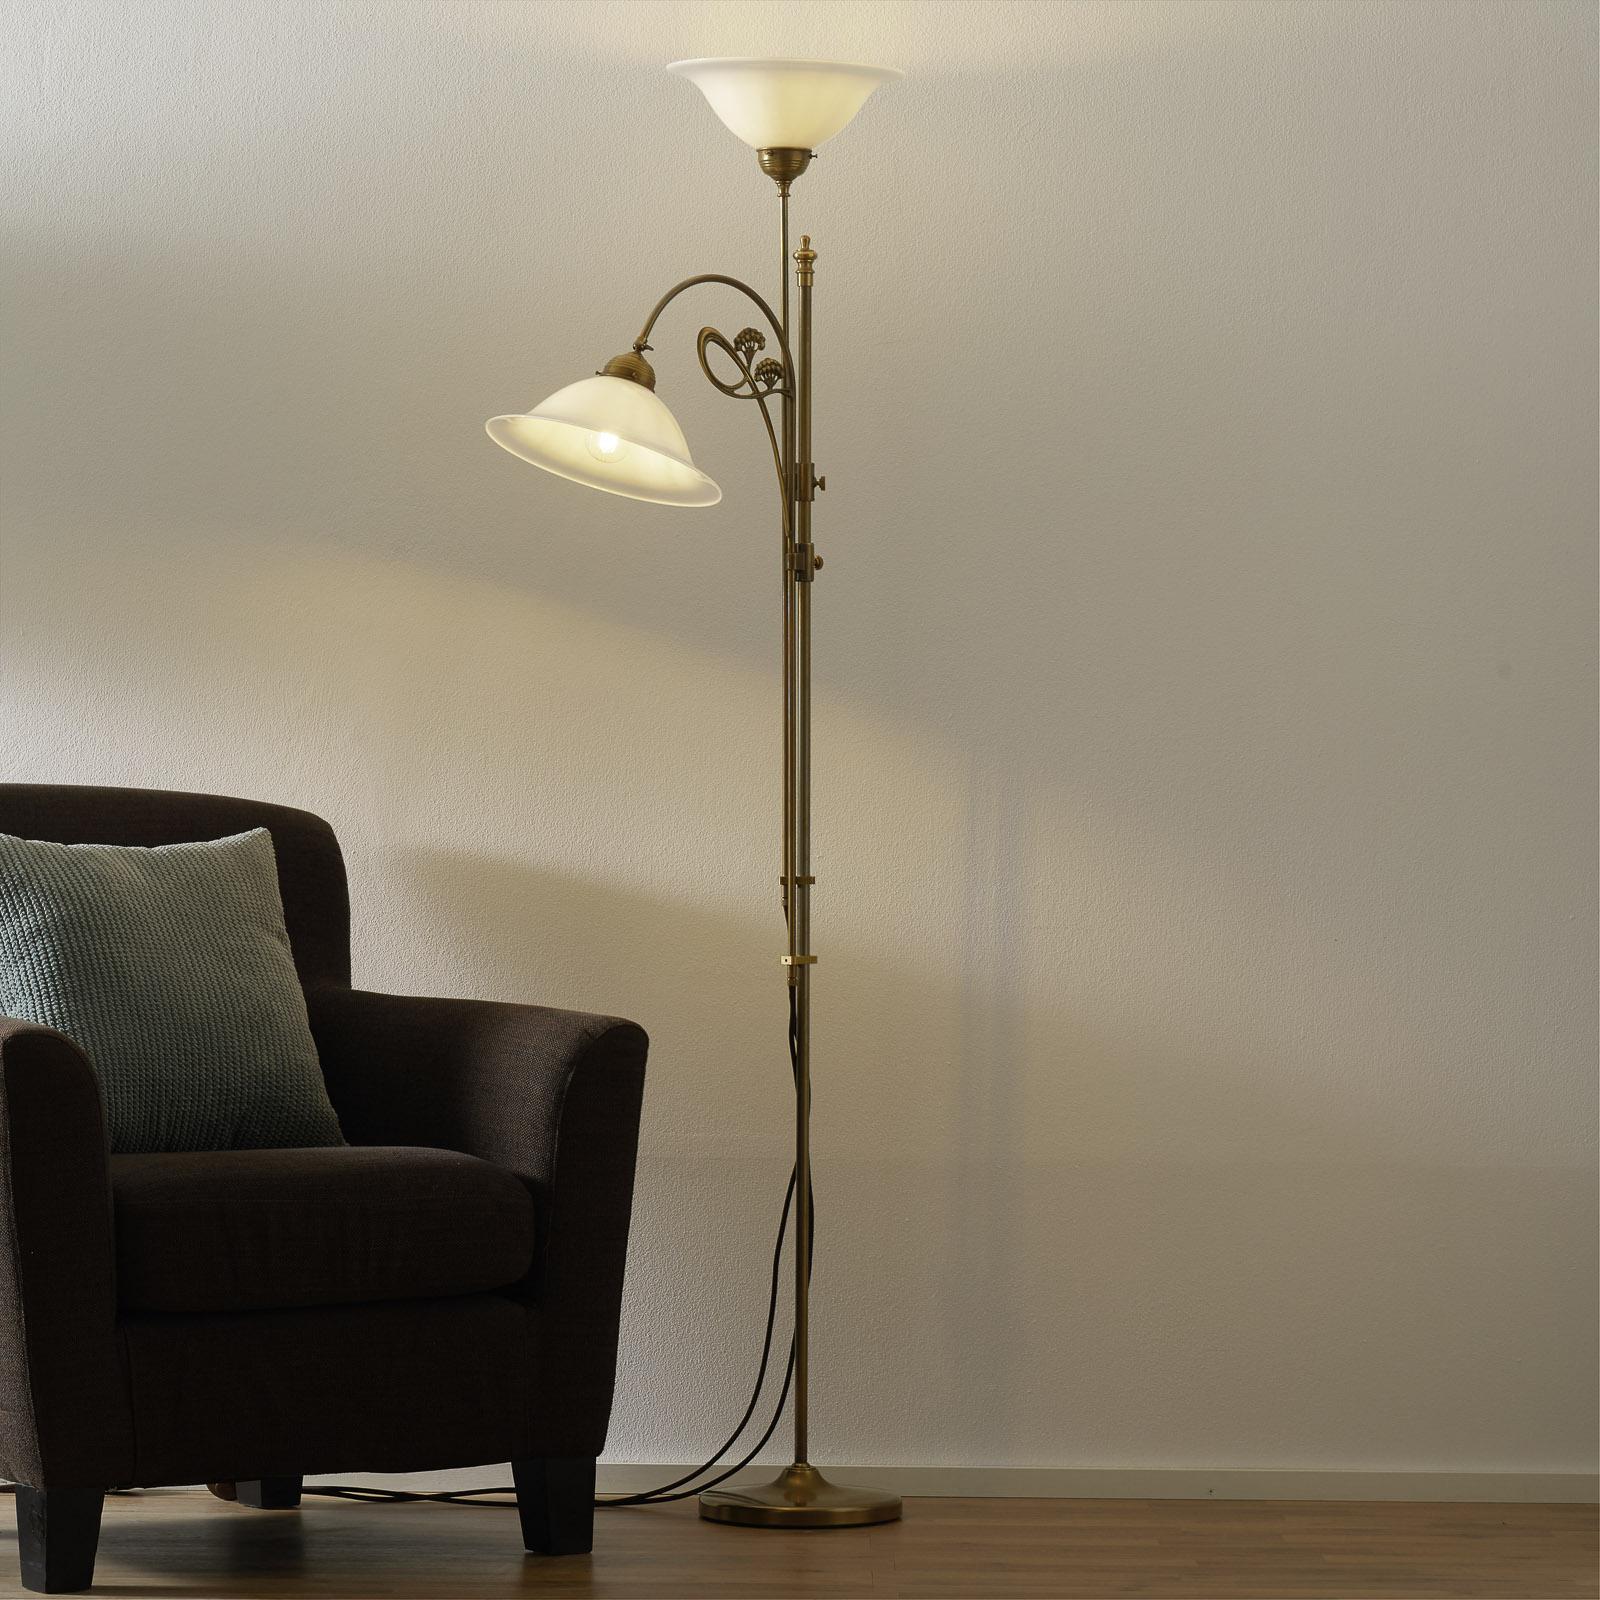 Messing-vloerlamp Alwine, 2-lichts